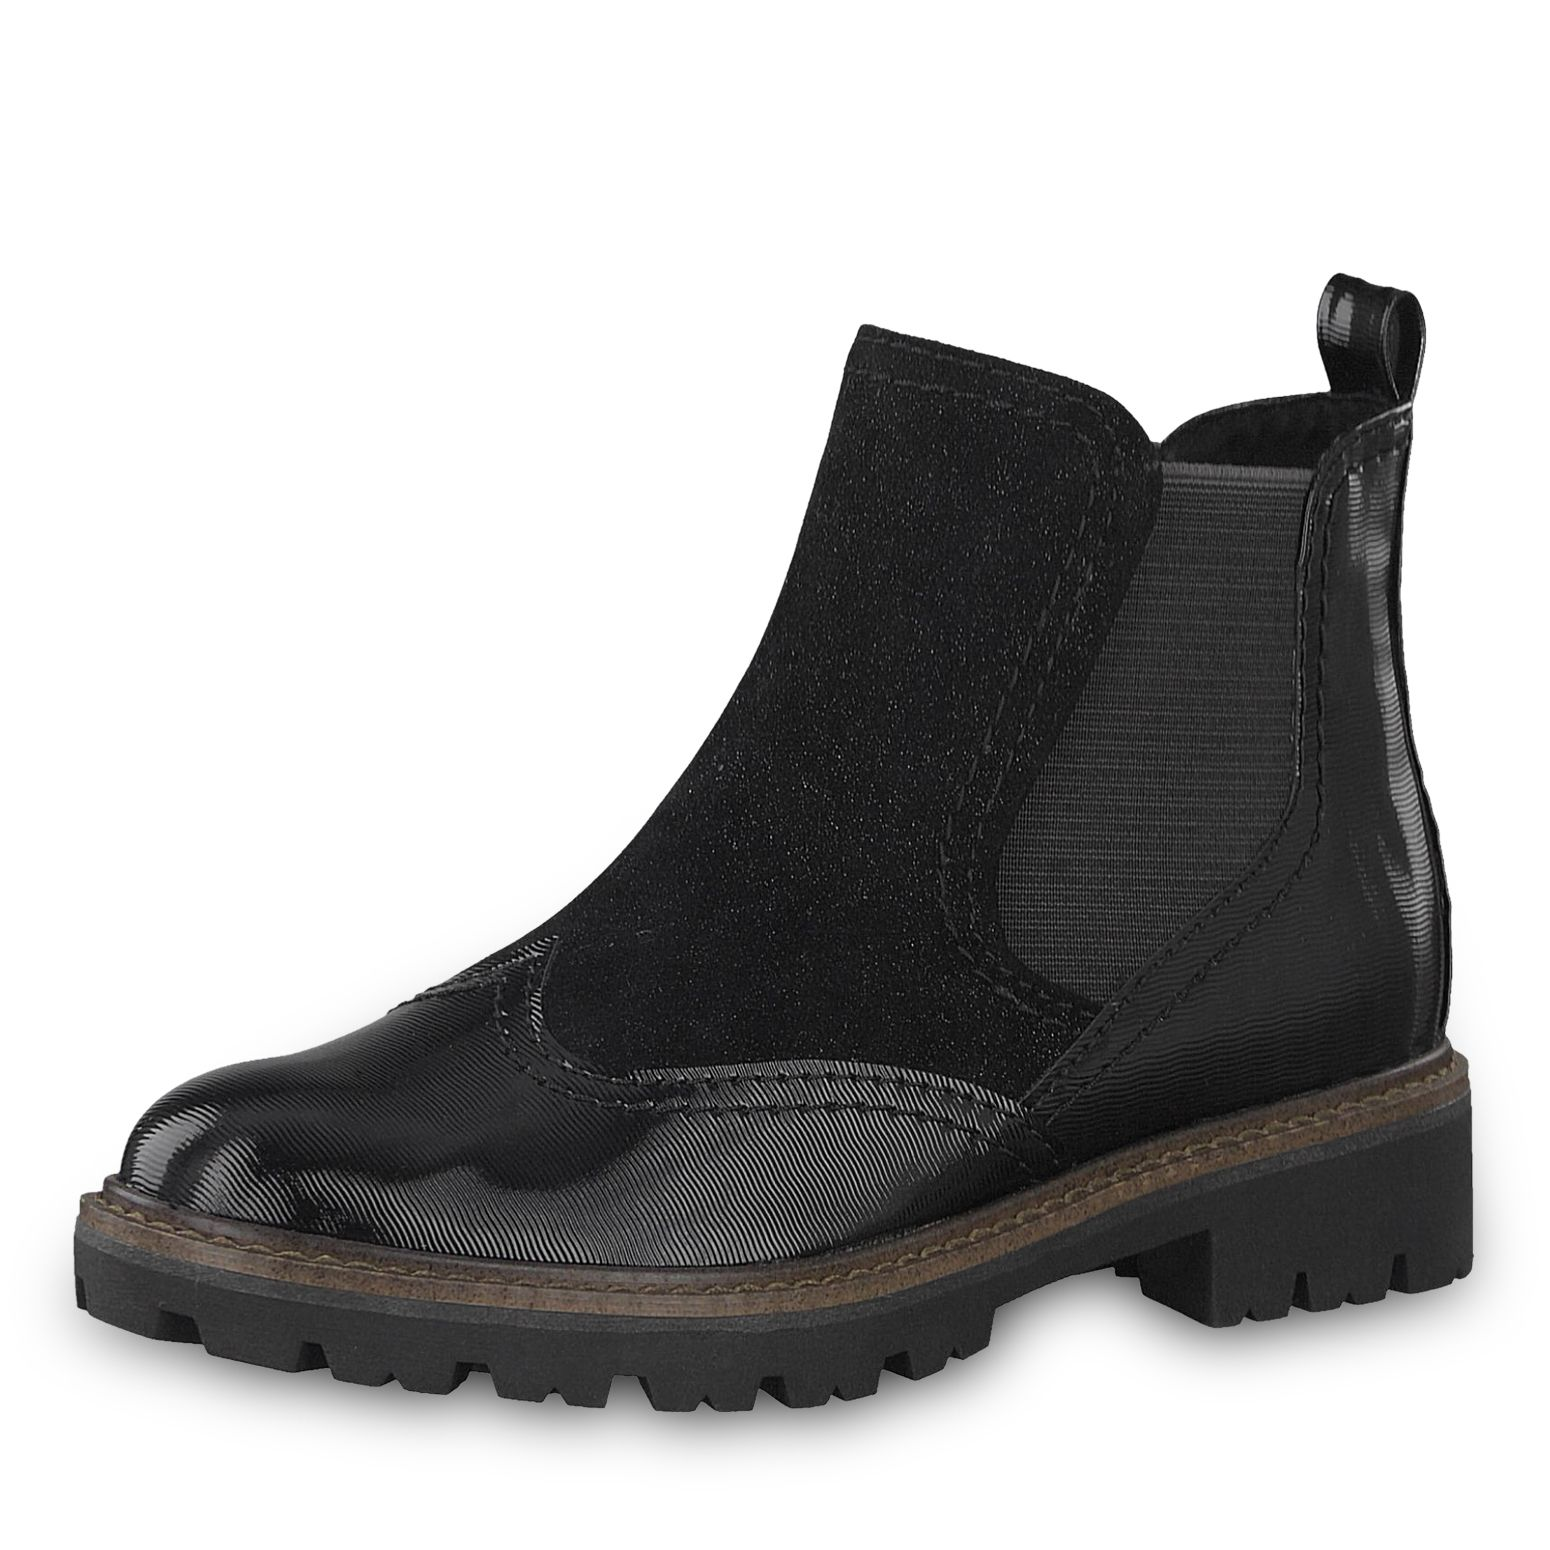 bargni 2 2 25412 39 chelsea boots von marco tozzi online kaufen. Black Bedroom Furniture Sets. Home Design Ideas